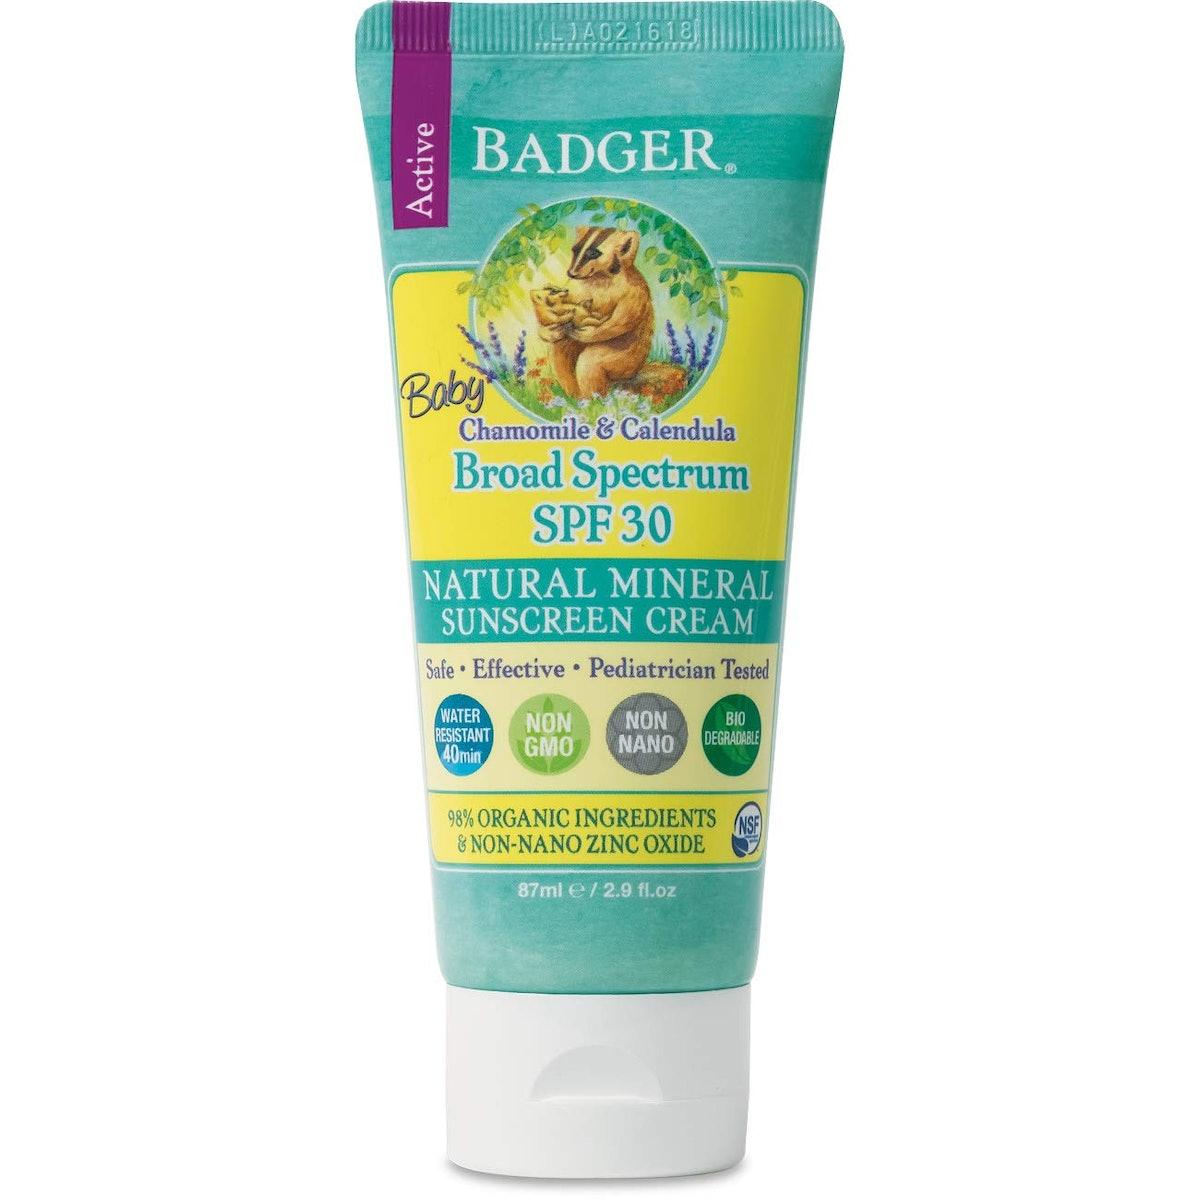 Badger Baby SPF 30 Sunscreen